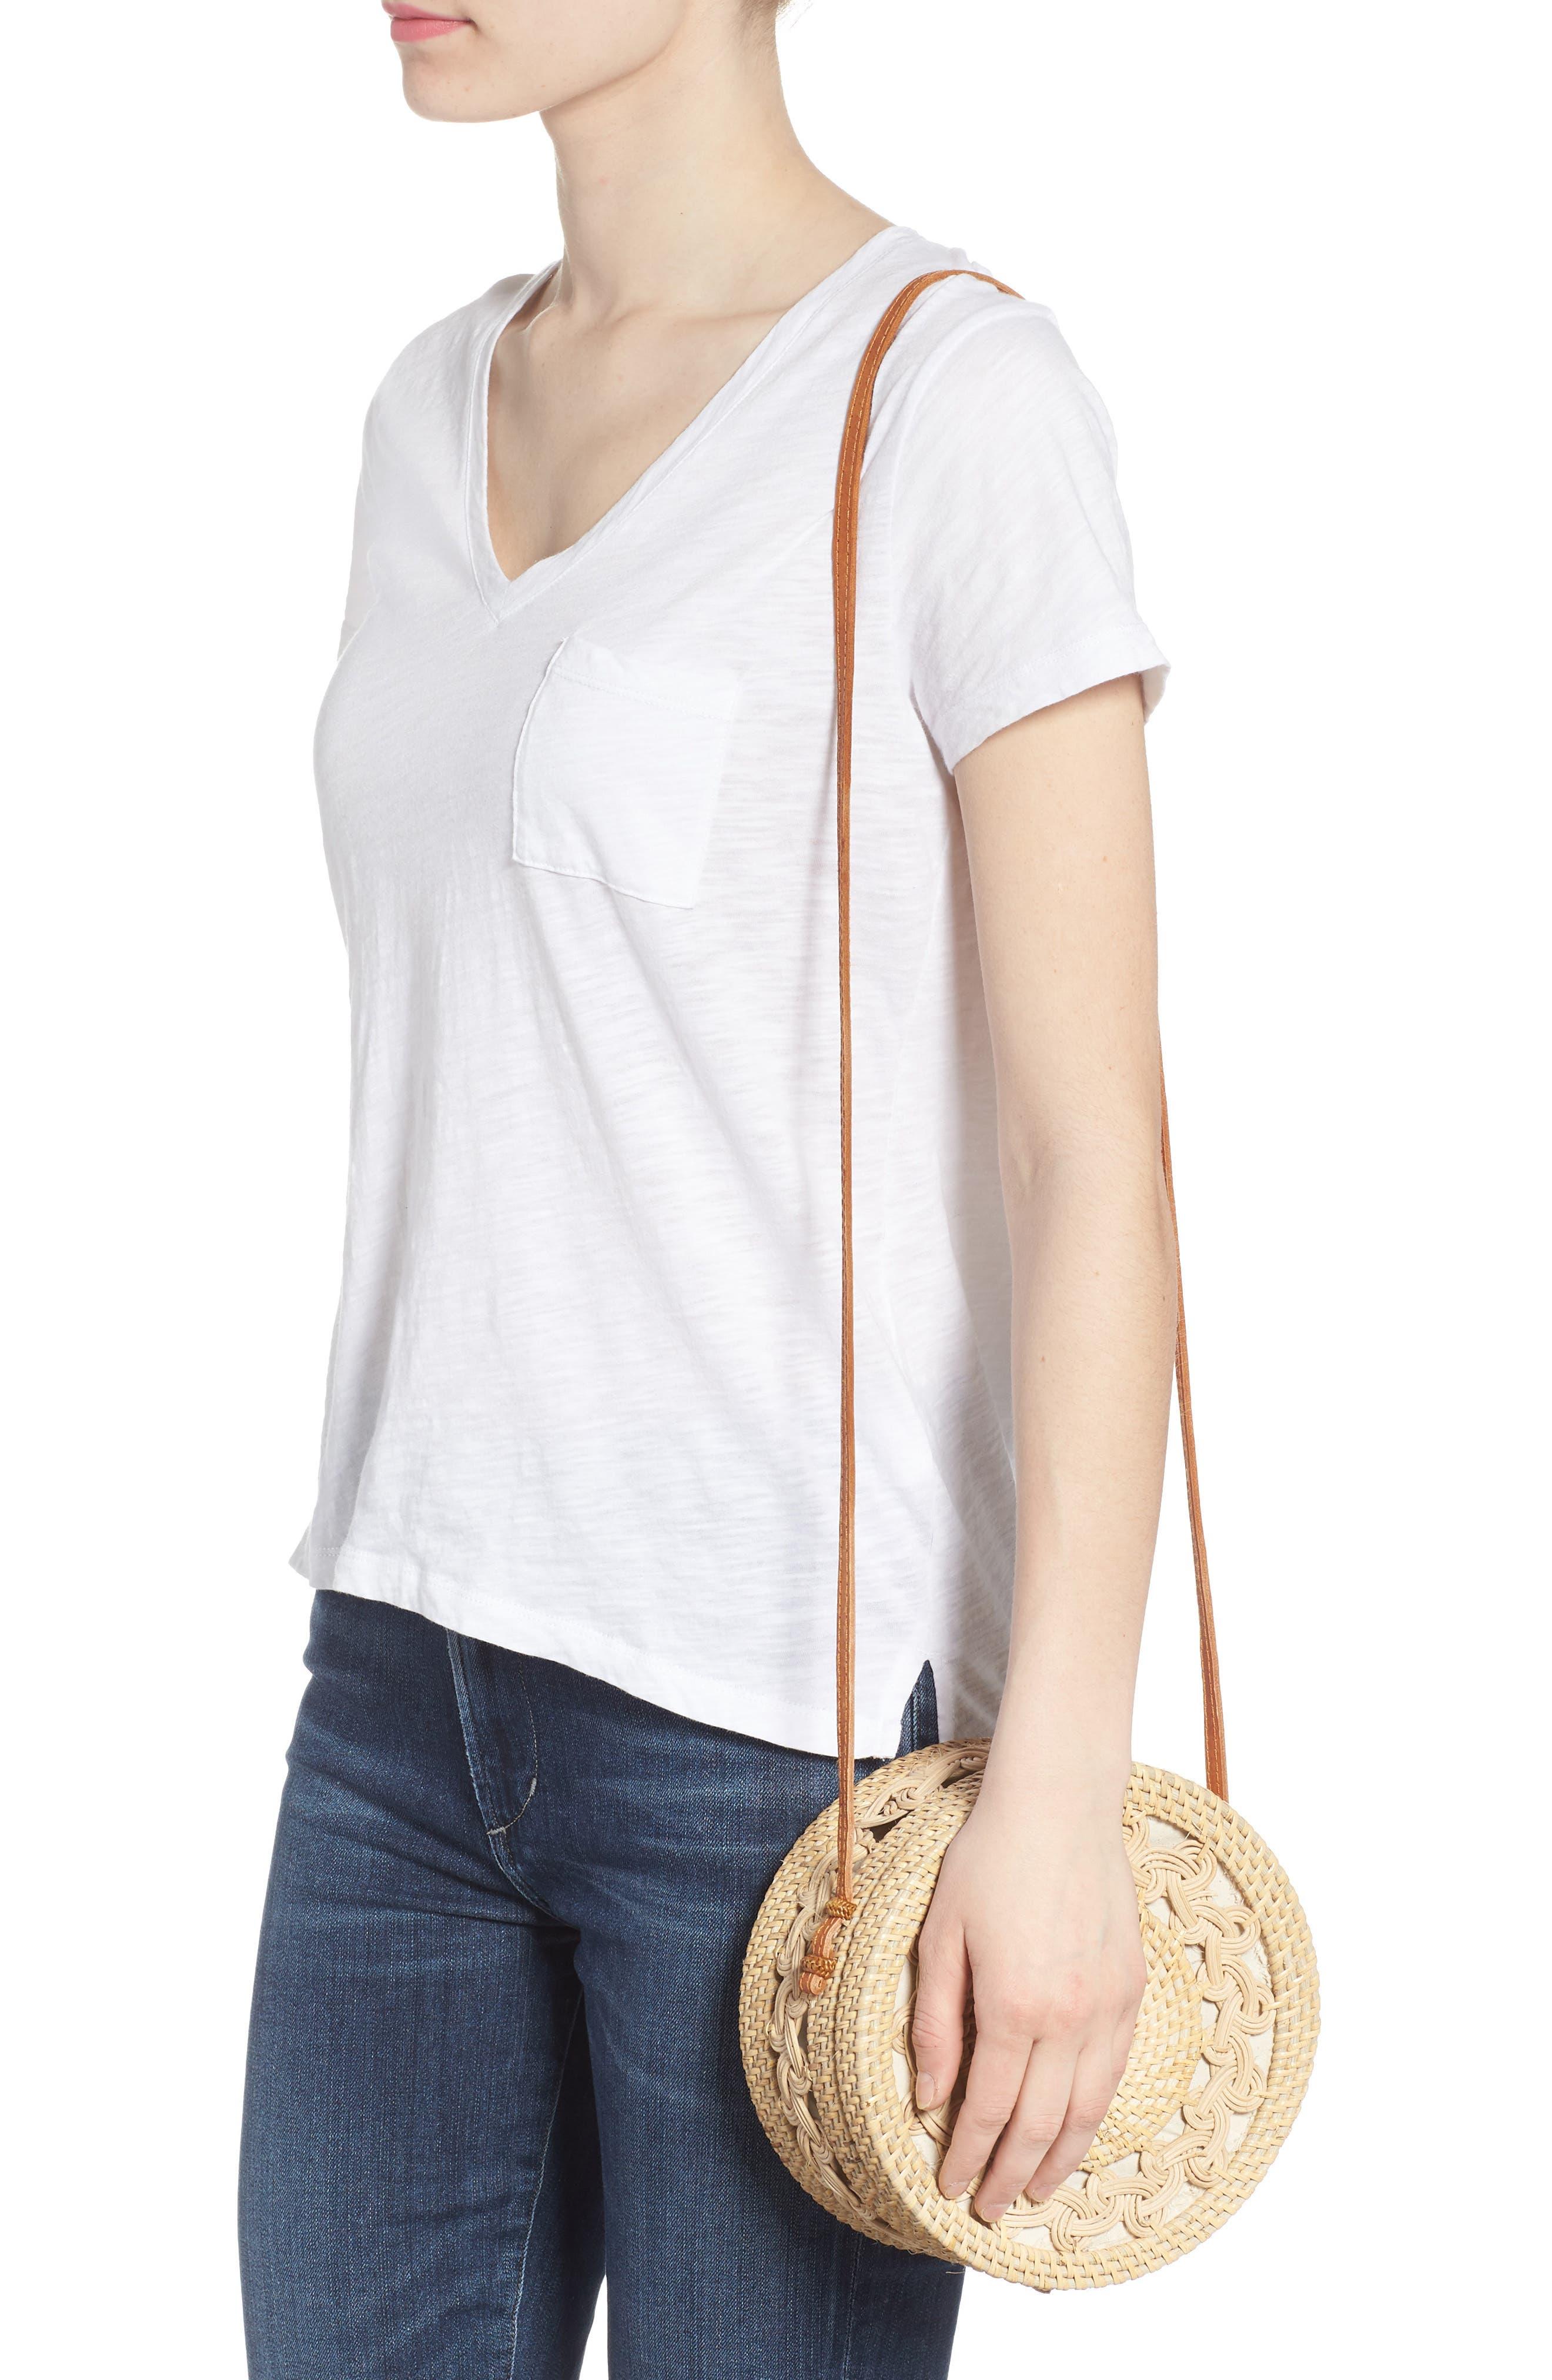 Woven Rattan Circle Crossbody Bag,                             Alternate thumbnail 2, color,                             Lighter Tan/ Natural